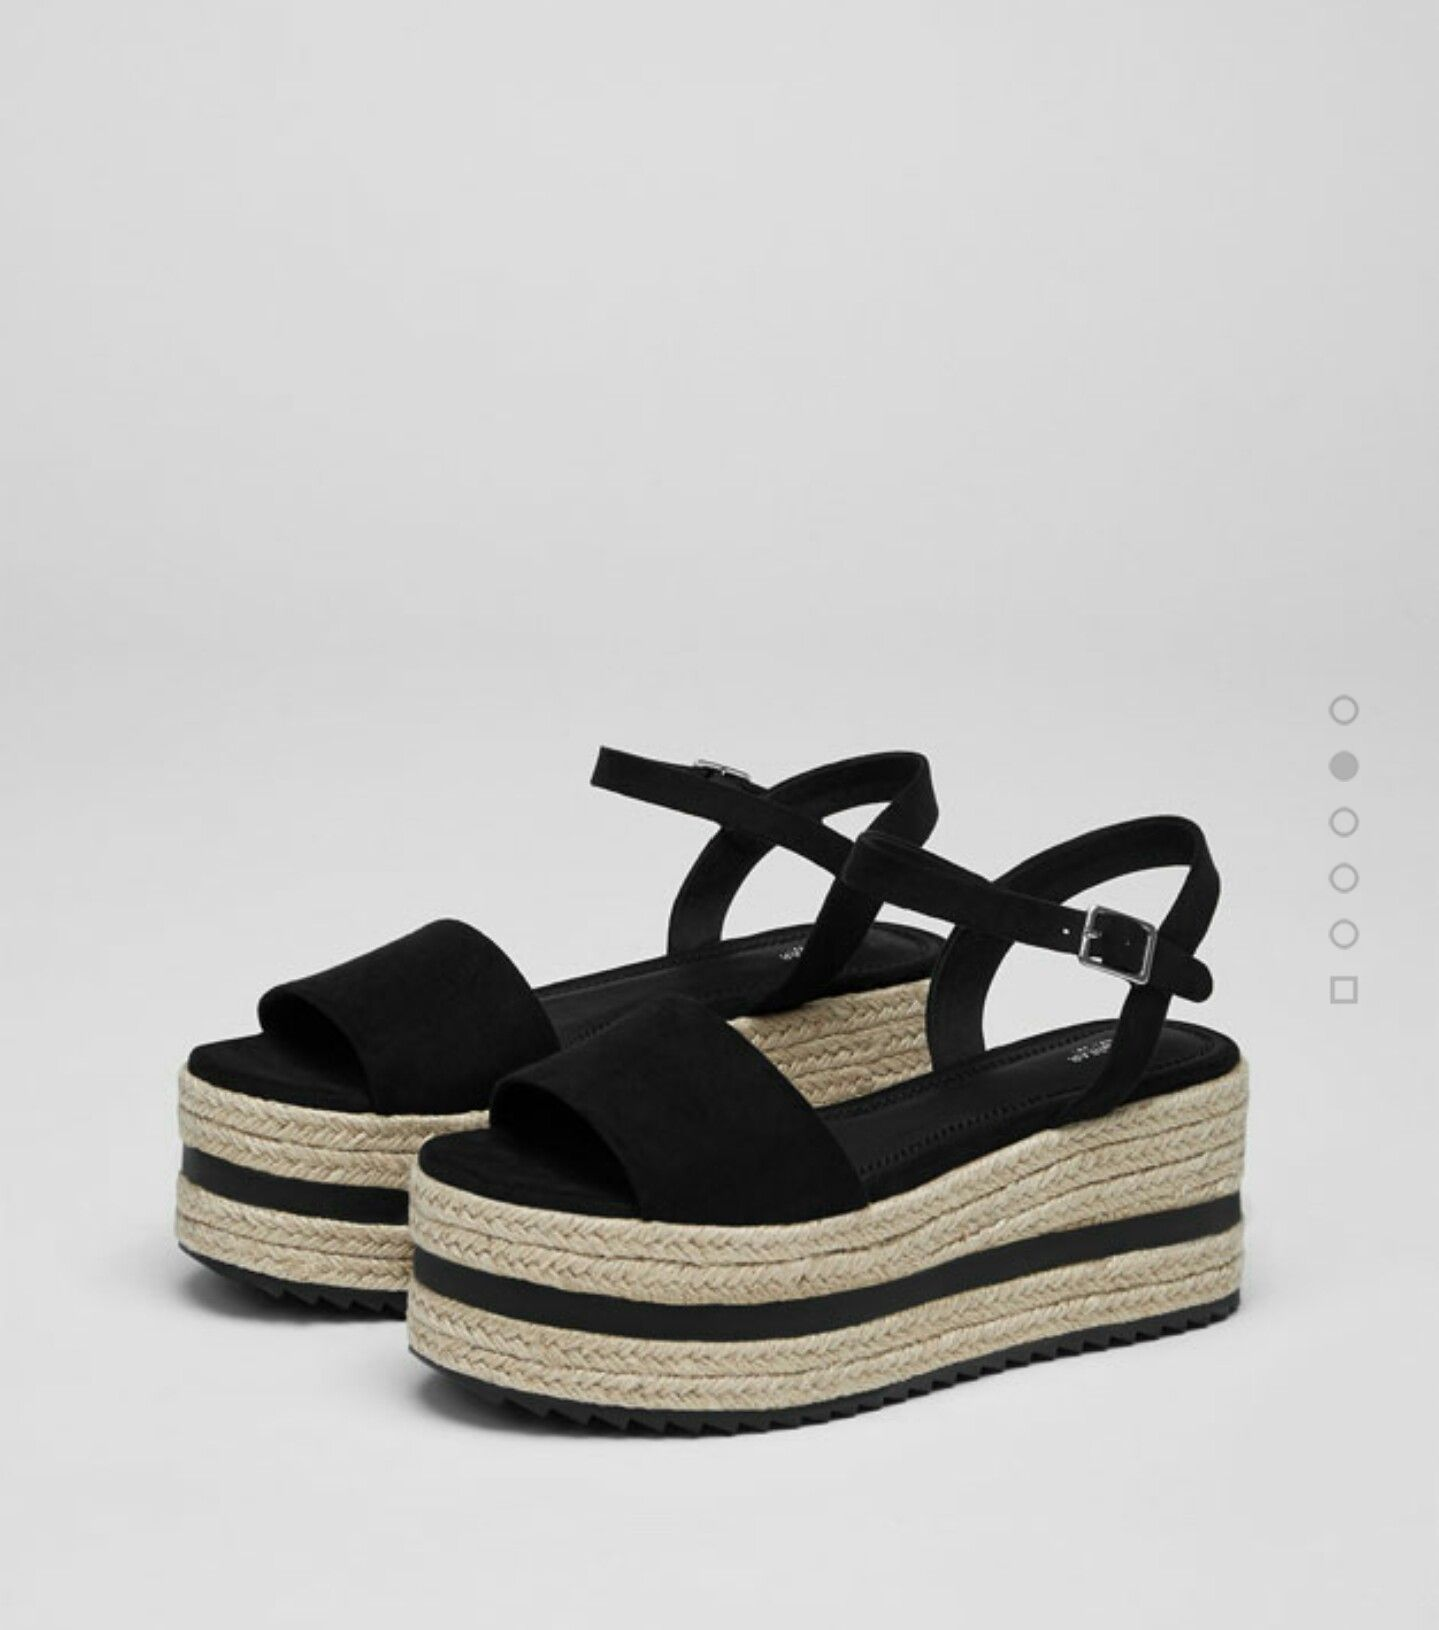 Flatform sandals Pull&bear spring summer 2017